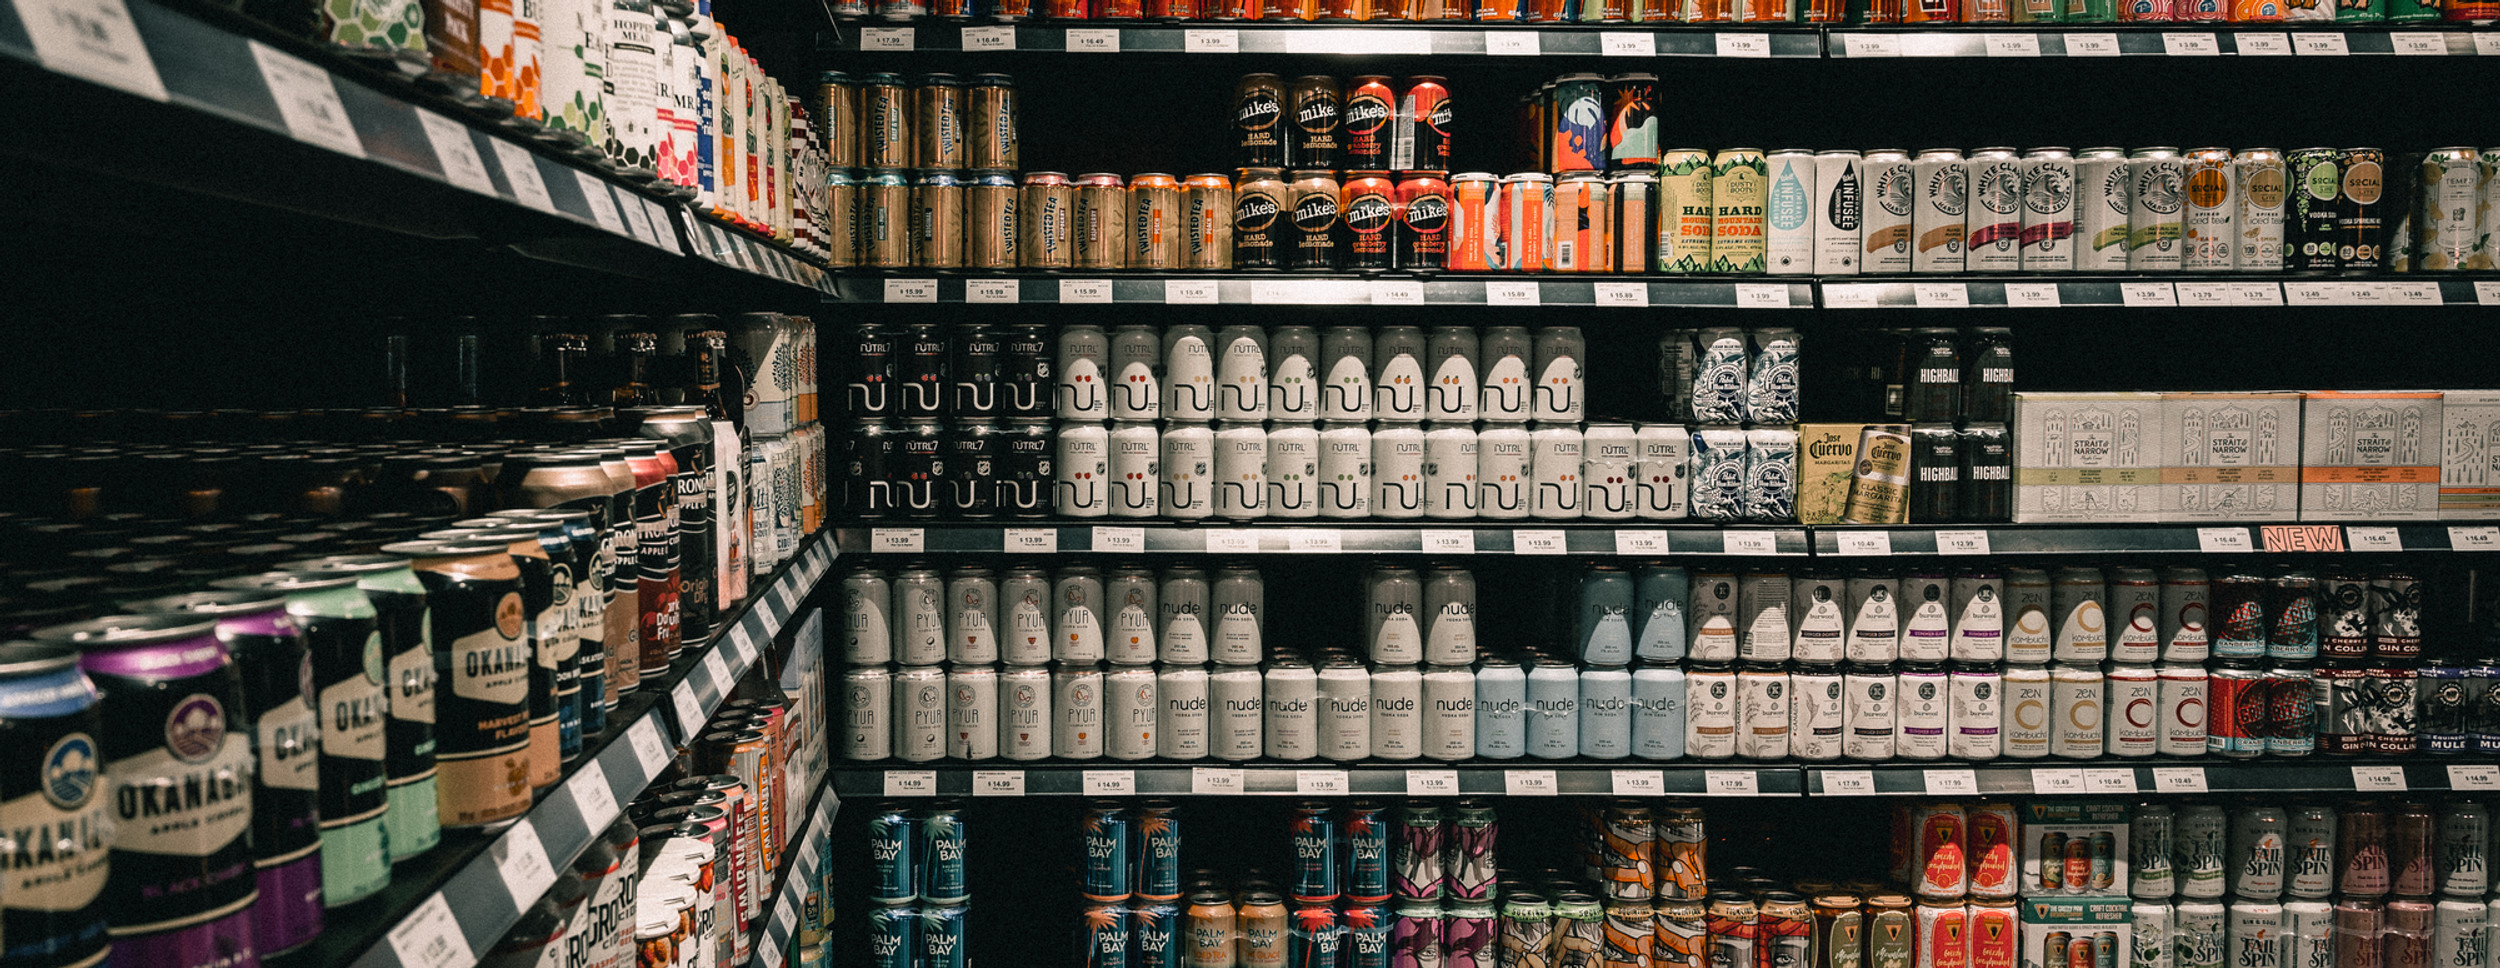 distilledliquor_websitephoto (21 of 27).